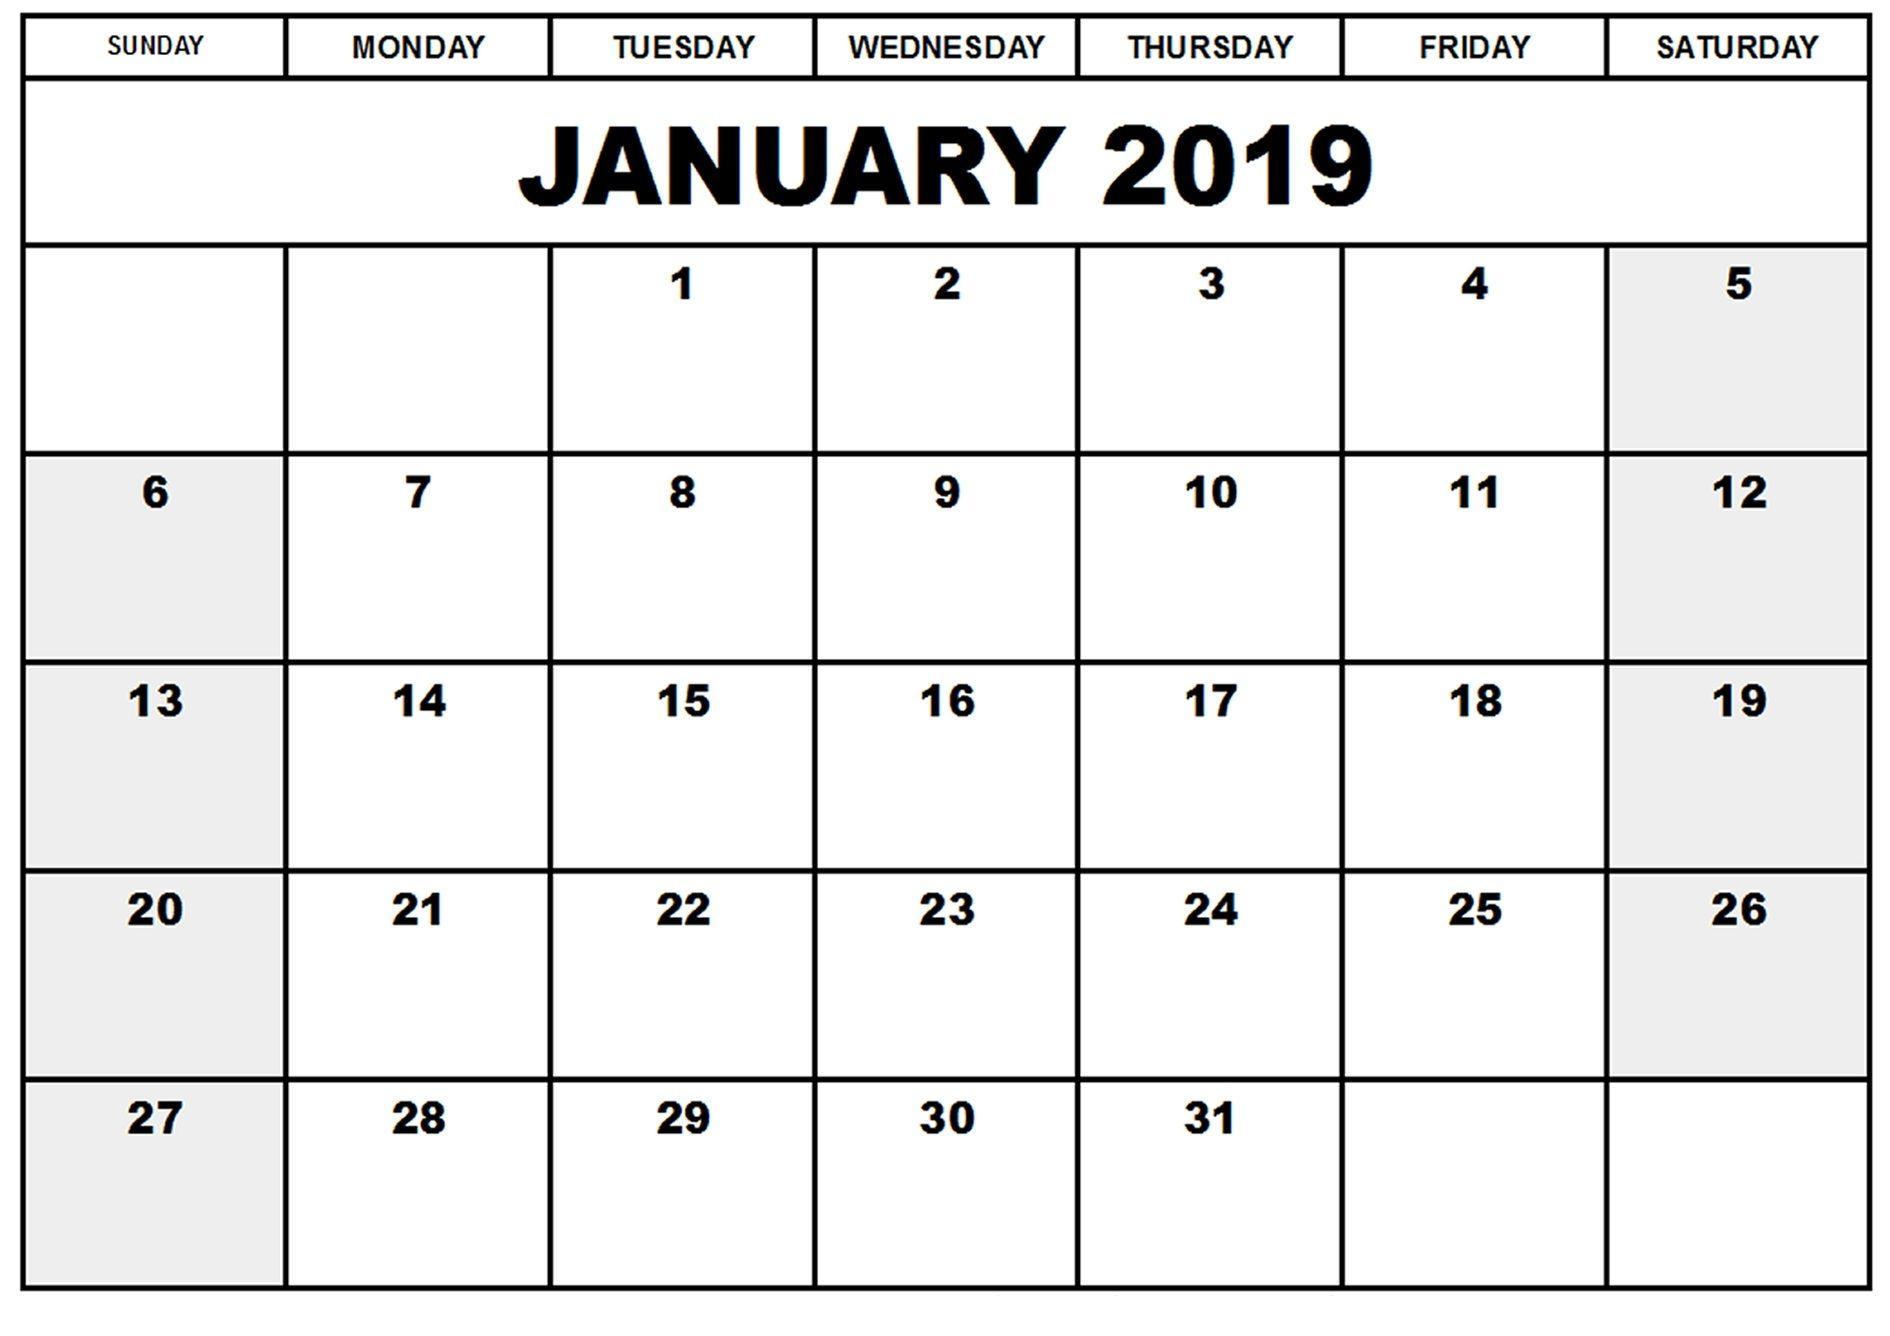 January 2019 Calendar Printable Template #printablecalendar